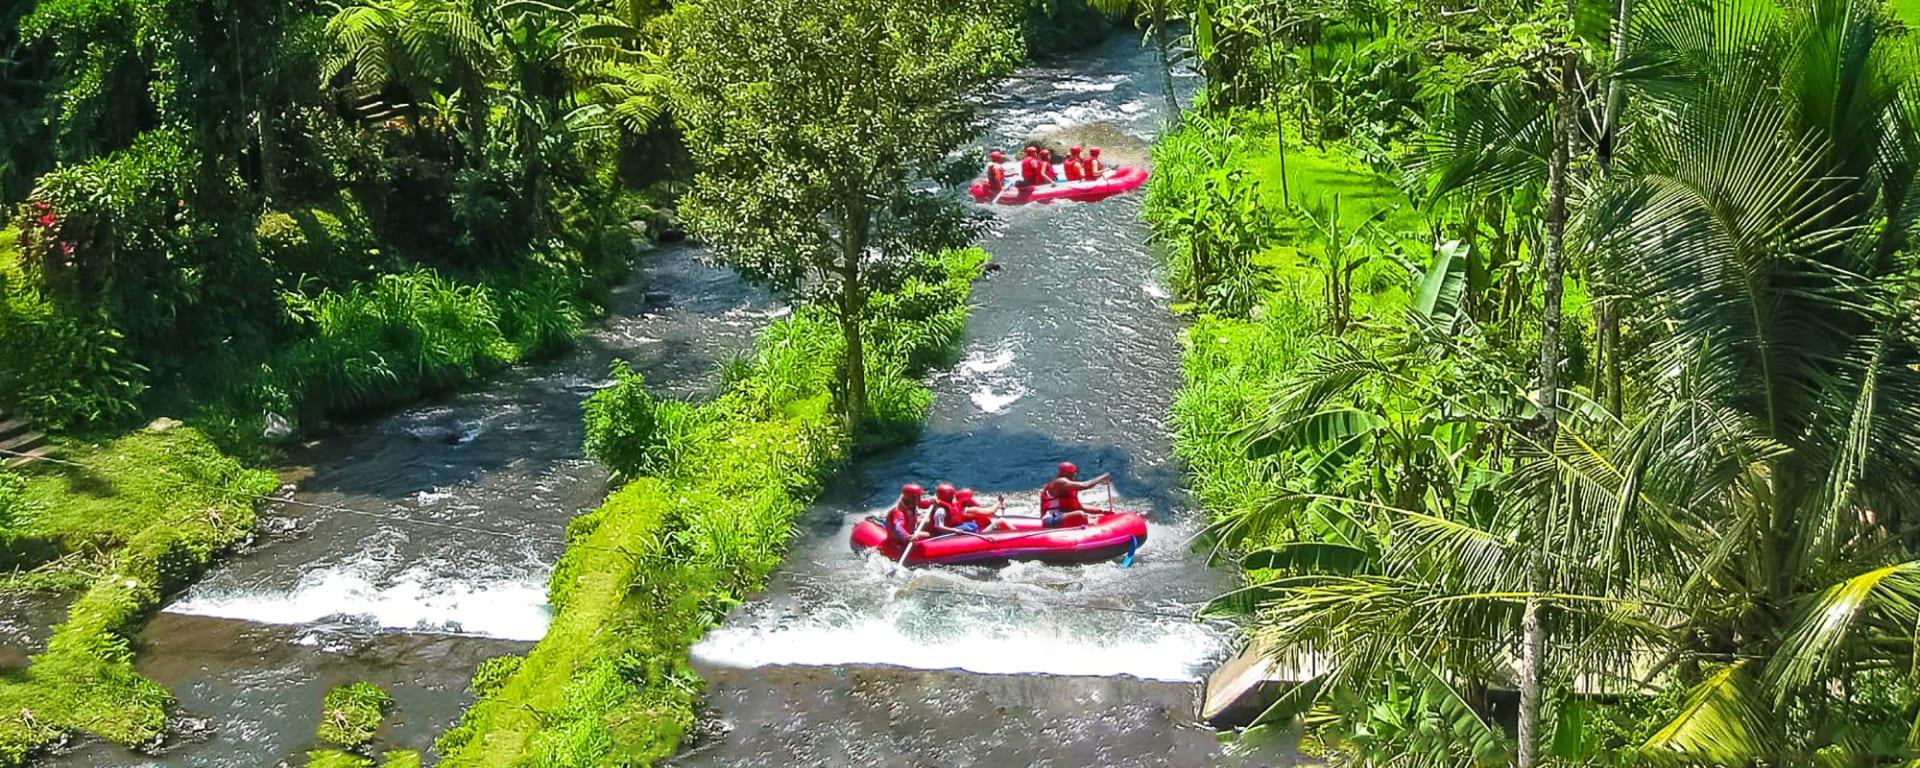 Découverte active de Bali de Sud de Bali: Bali - Rafting in the canyon